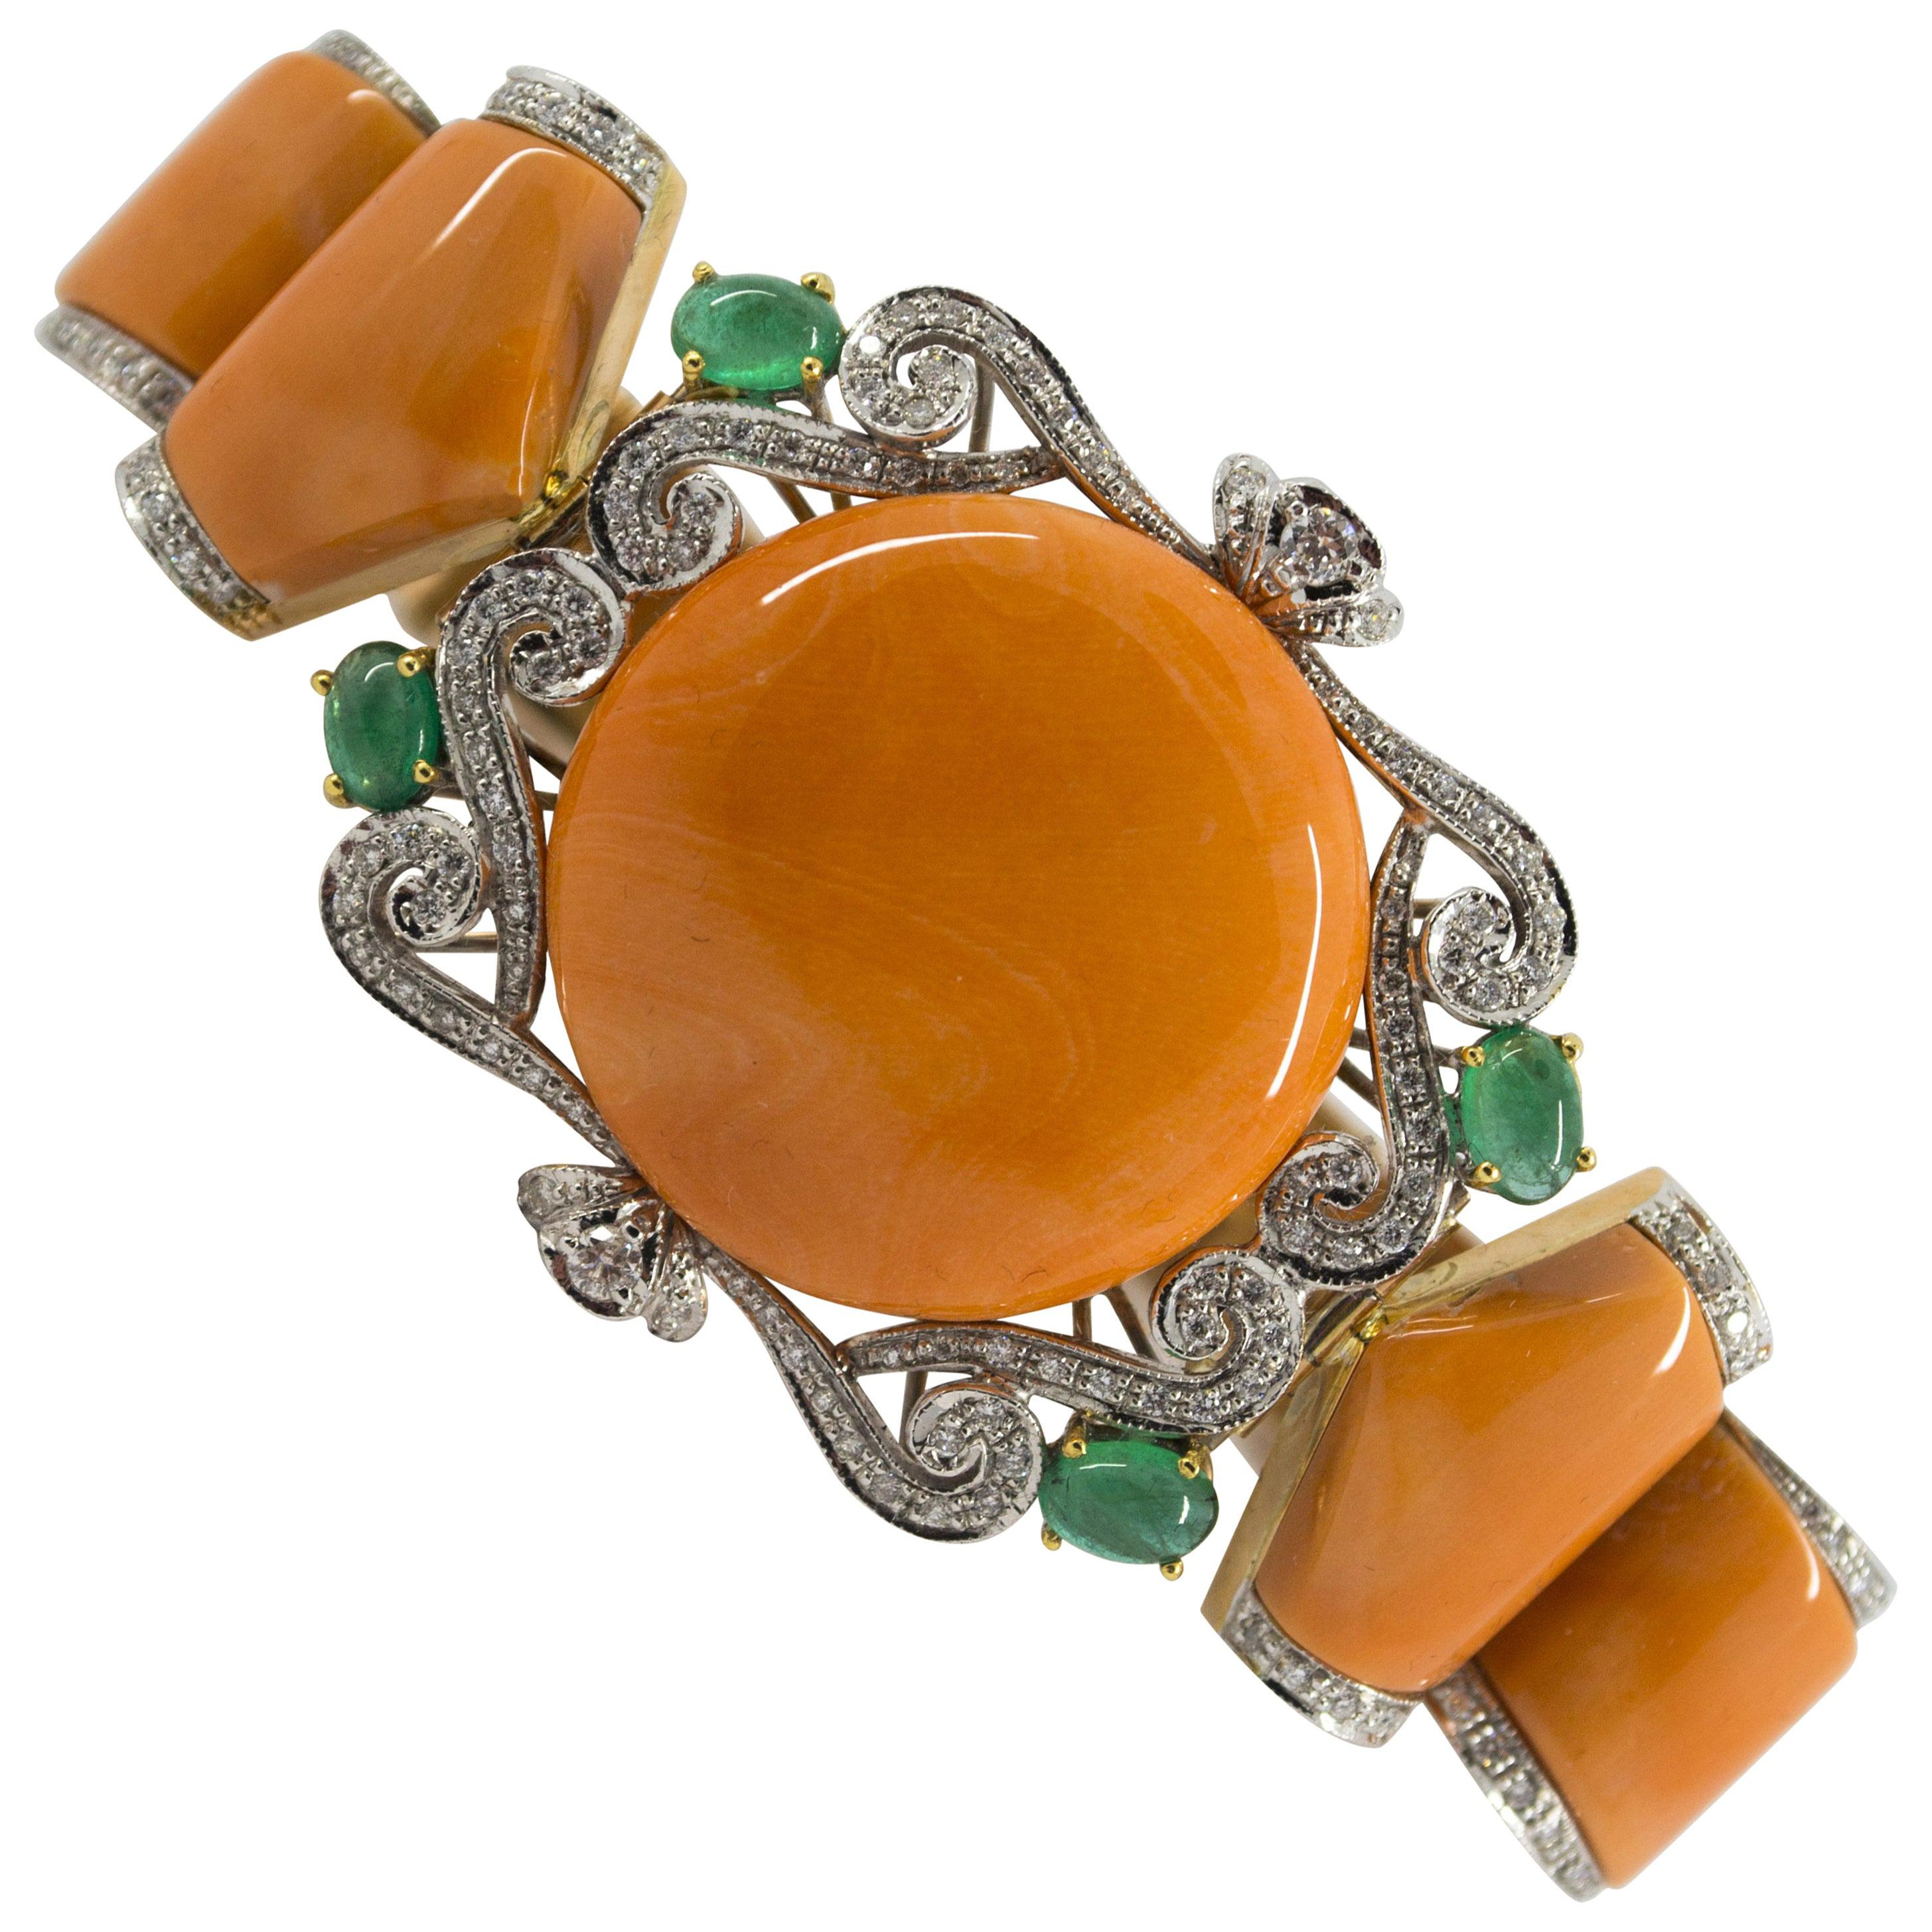 1.90 Carat White Diamond 2.20 Carat Emerald Peach Coral Yellow Gold Bracelet